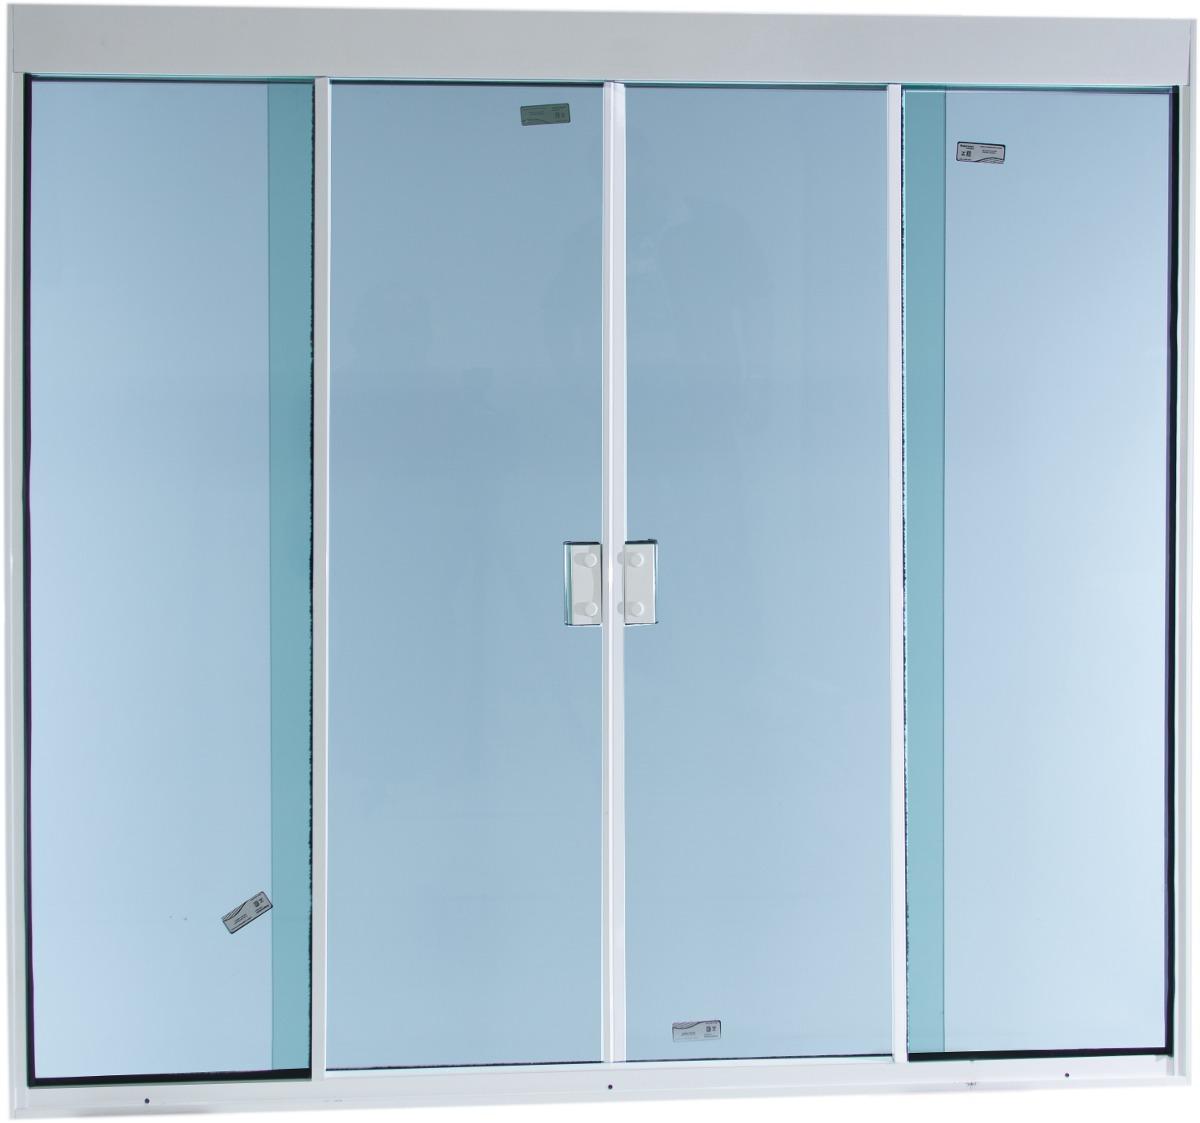 #436C88 Jenela 4f 1500x1200 Tipo Blindex Alum Branco Temp Verde R$ 519 00 em  1744 Janela De Aluminio Ou Blindex